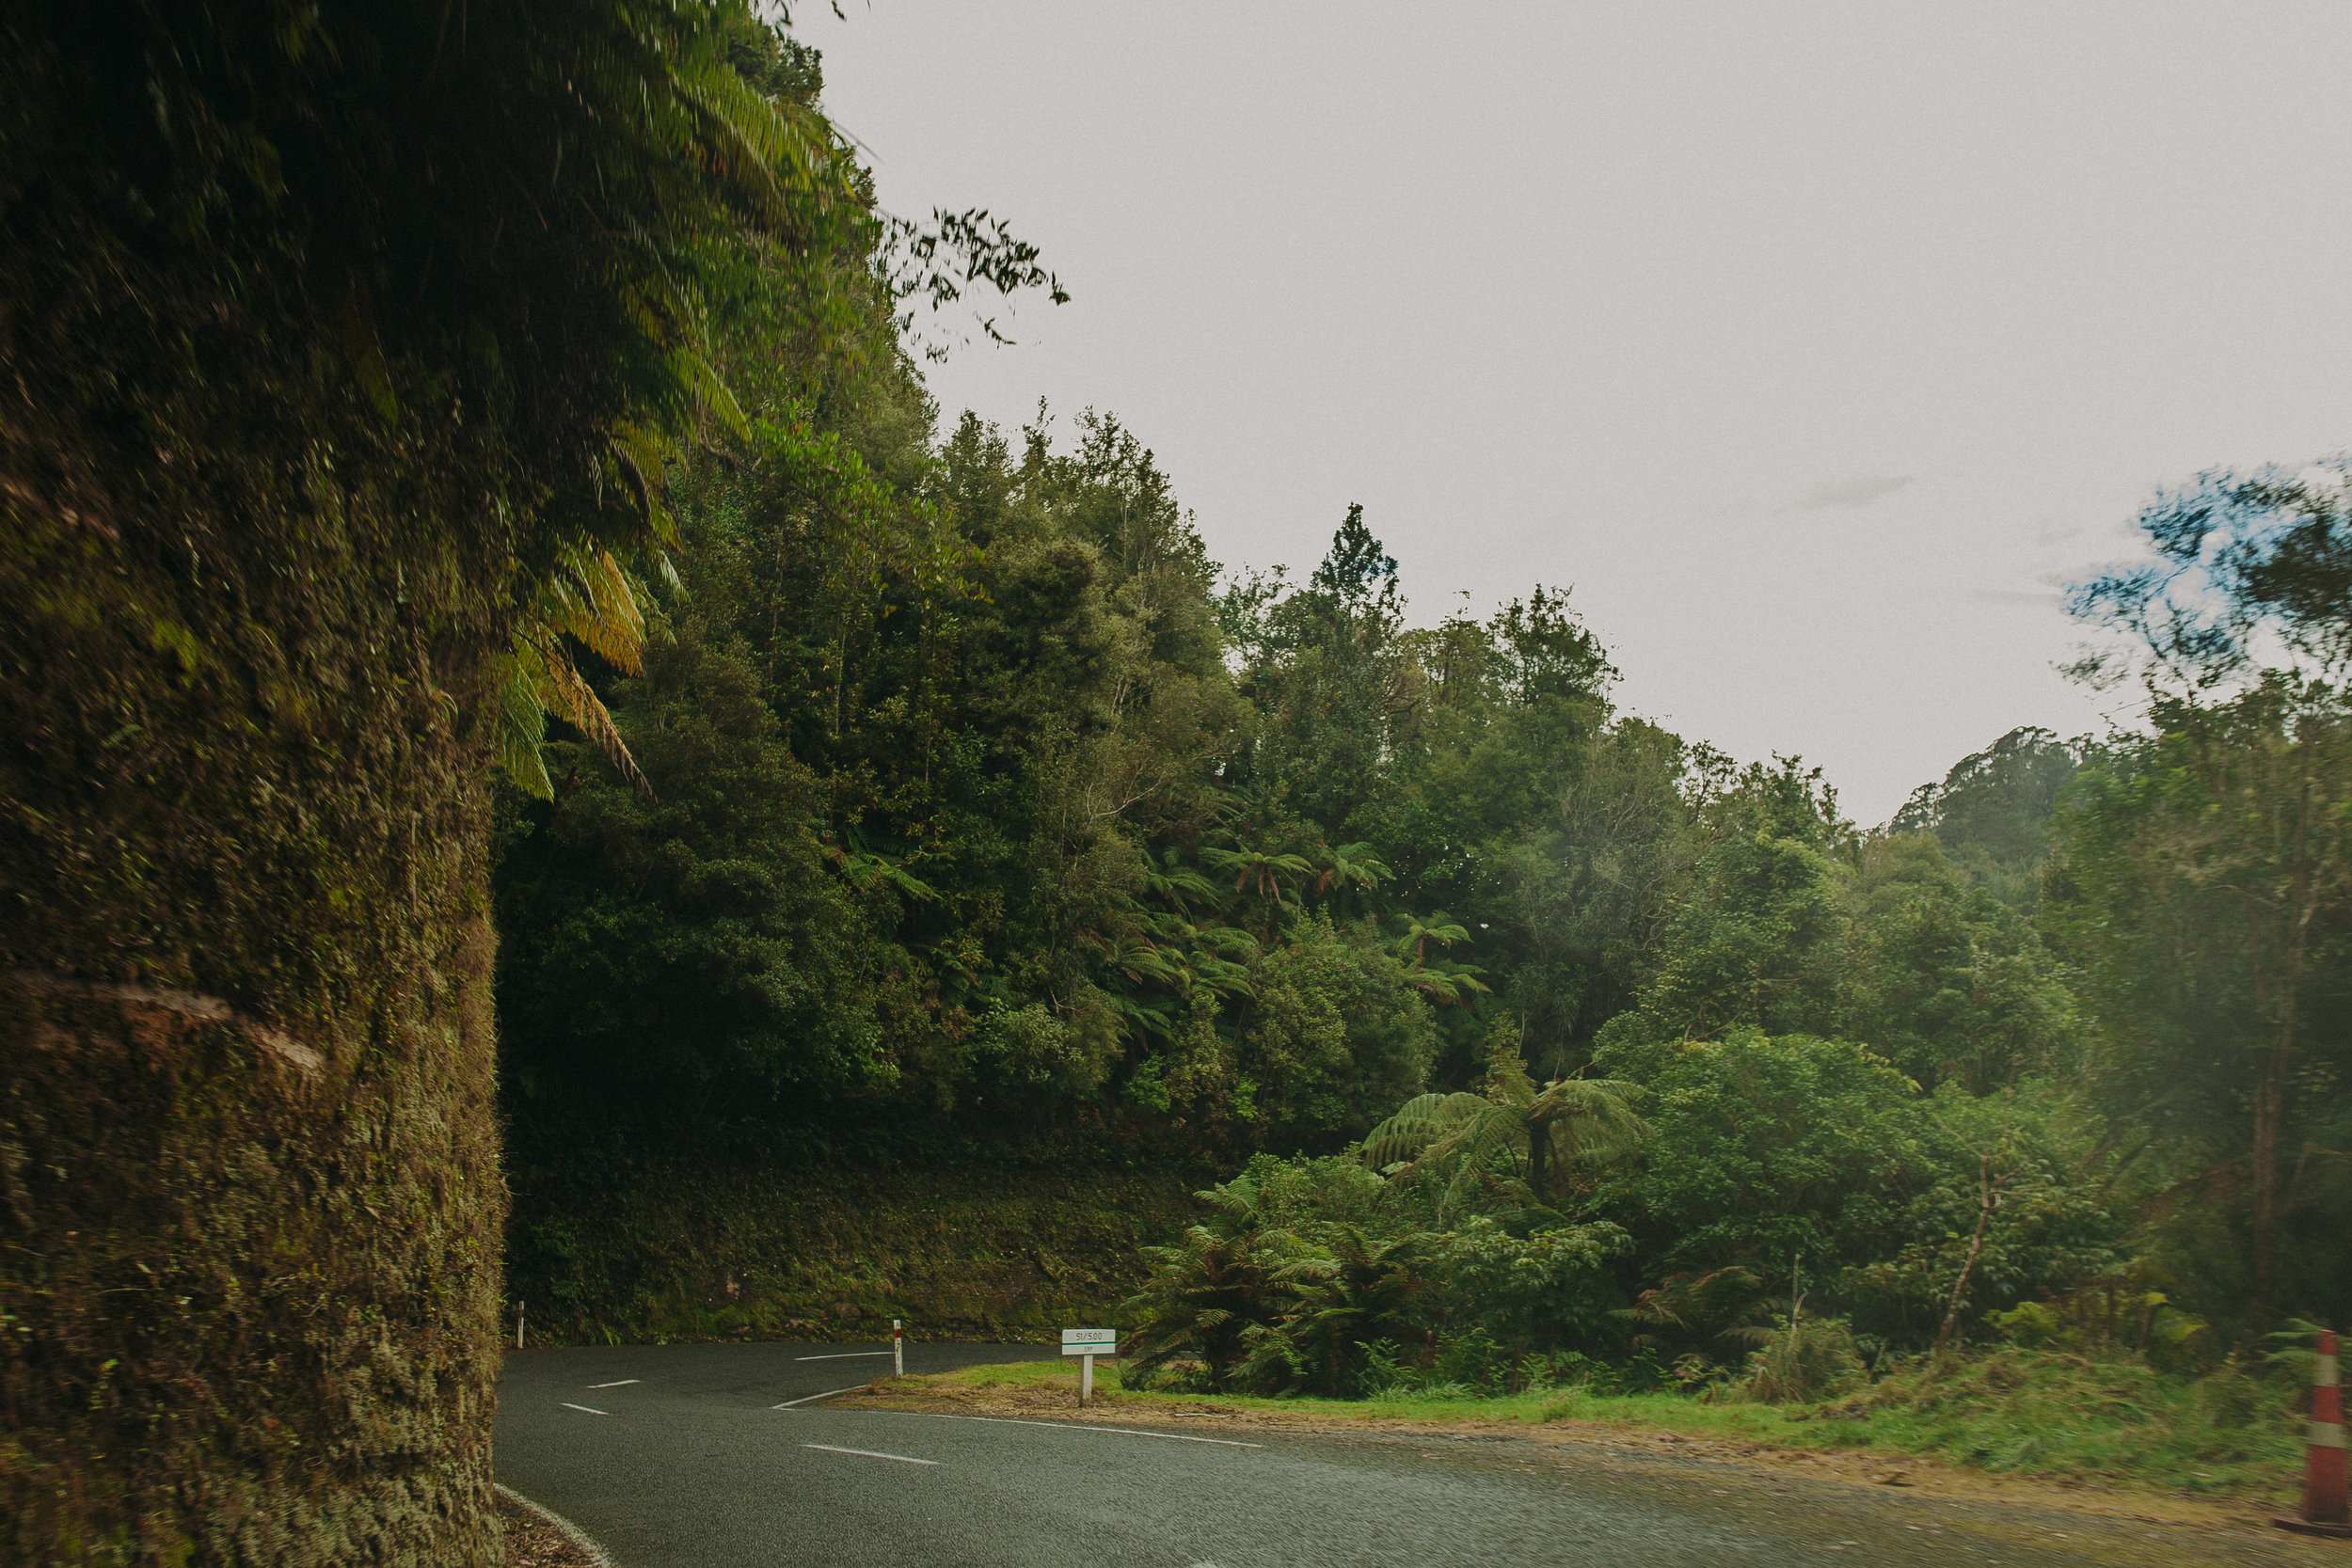 Forgotten-World-Highway-New-Zealand-29.jpg